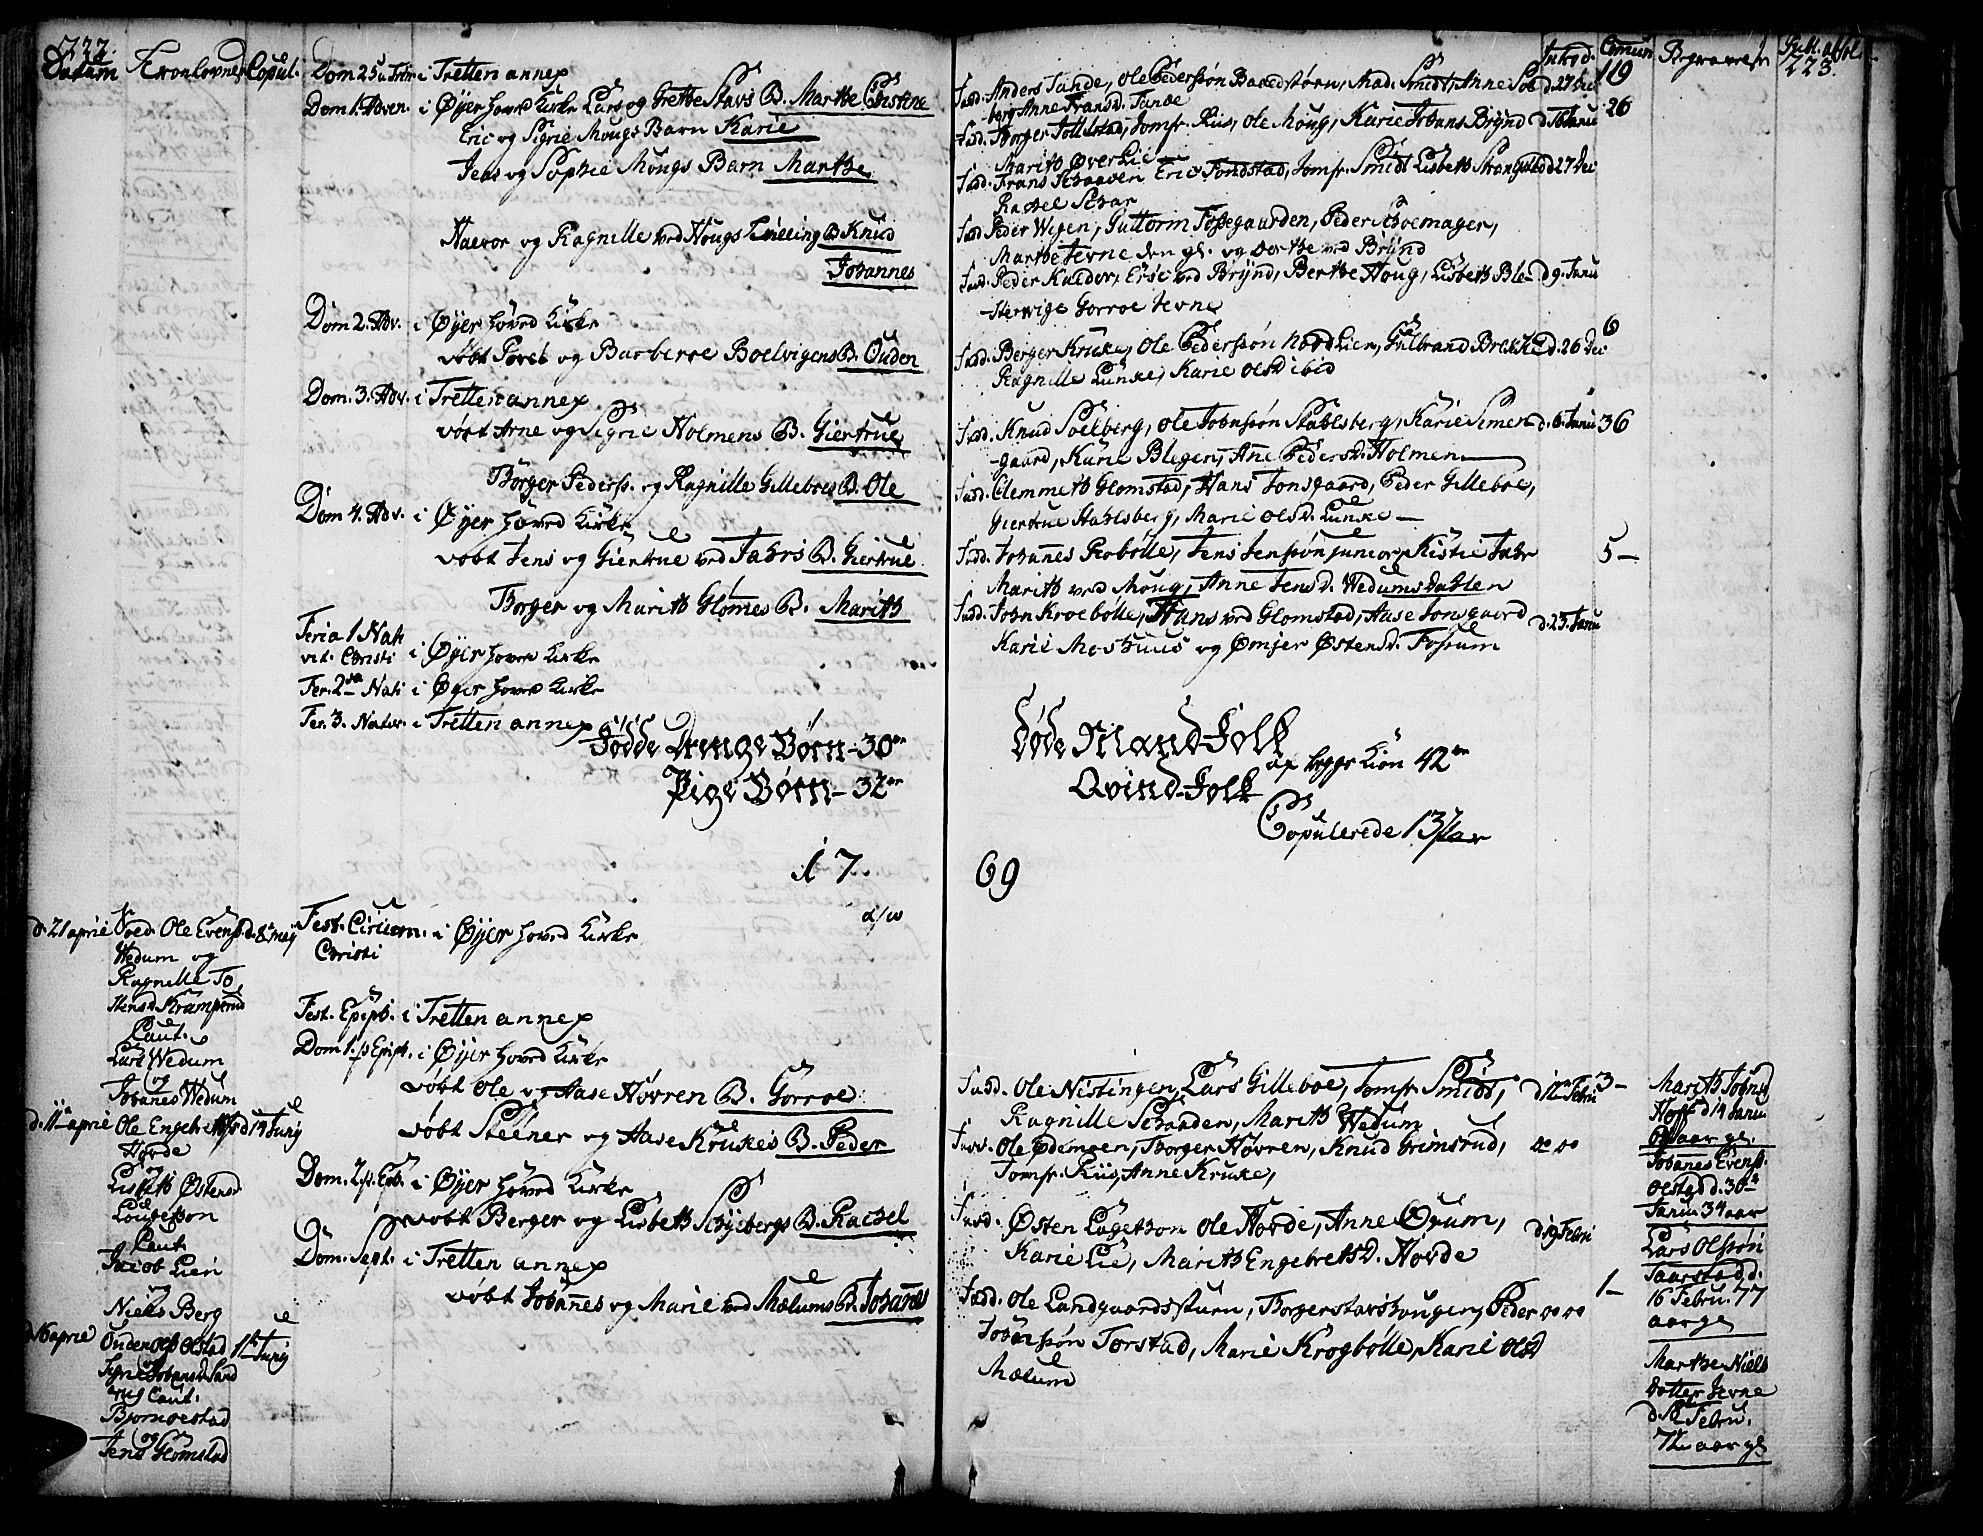 SAH, Øyer prestekontor, Ministerialbok nr. 2, 1733-1784, s. 222-223